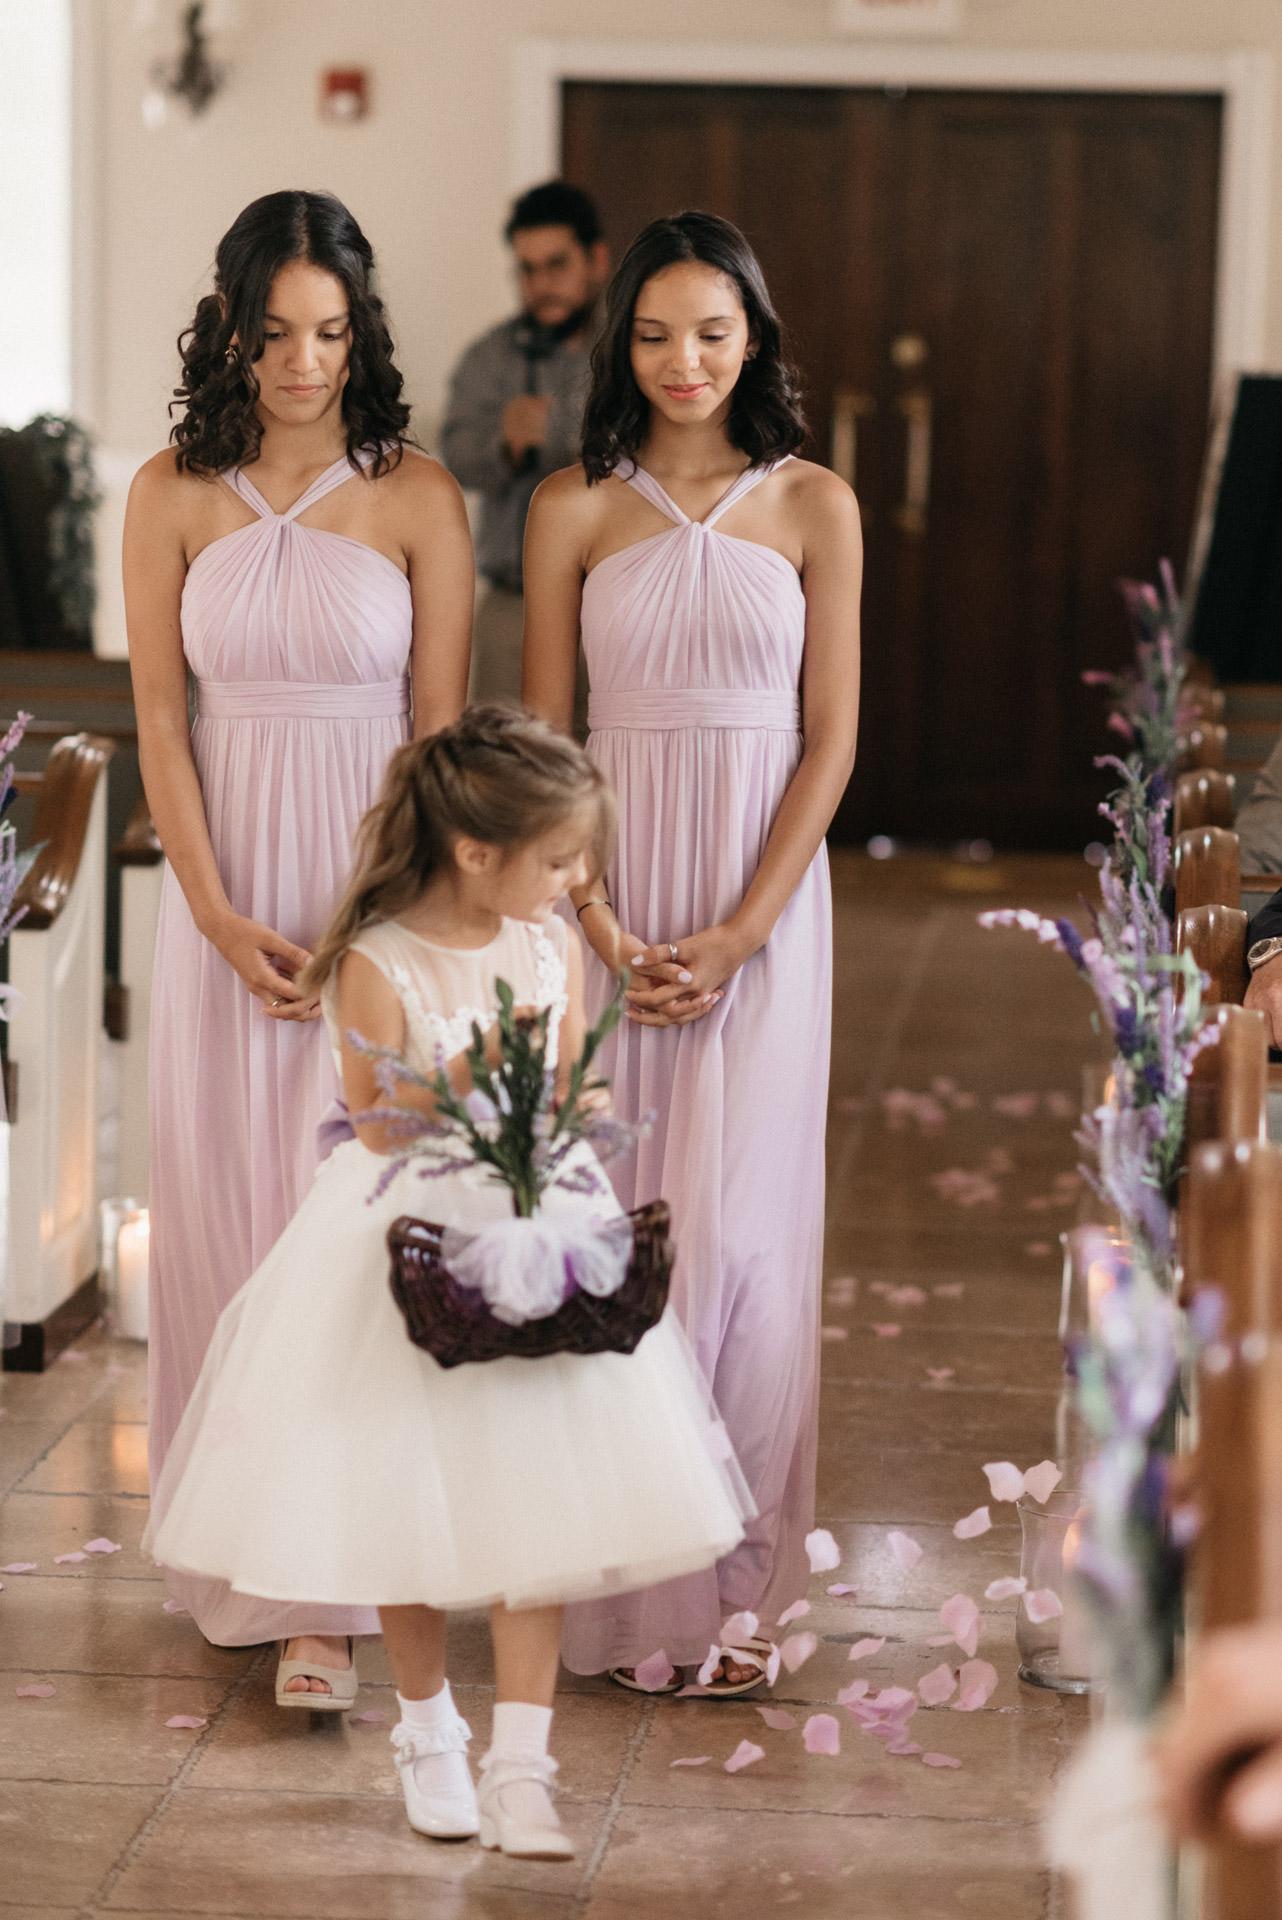 lexi-michael-wedding-blog-sm-49.jpg